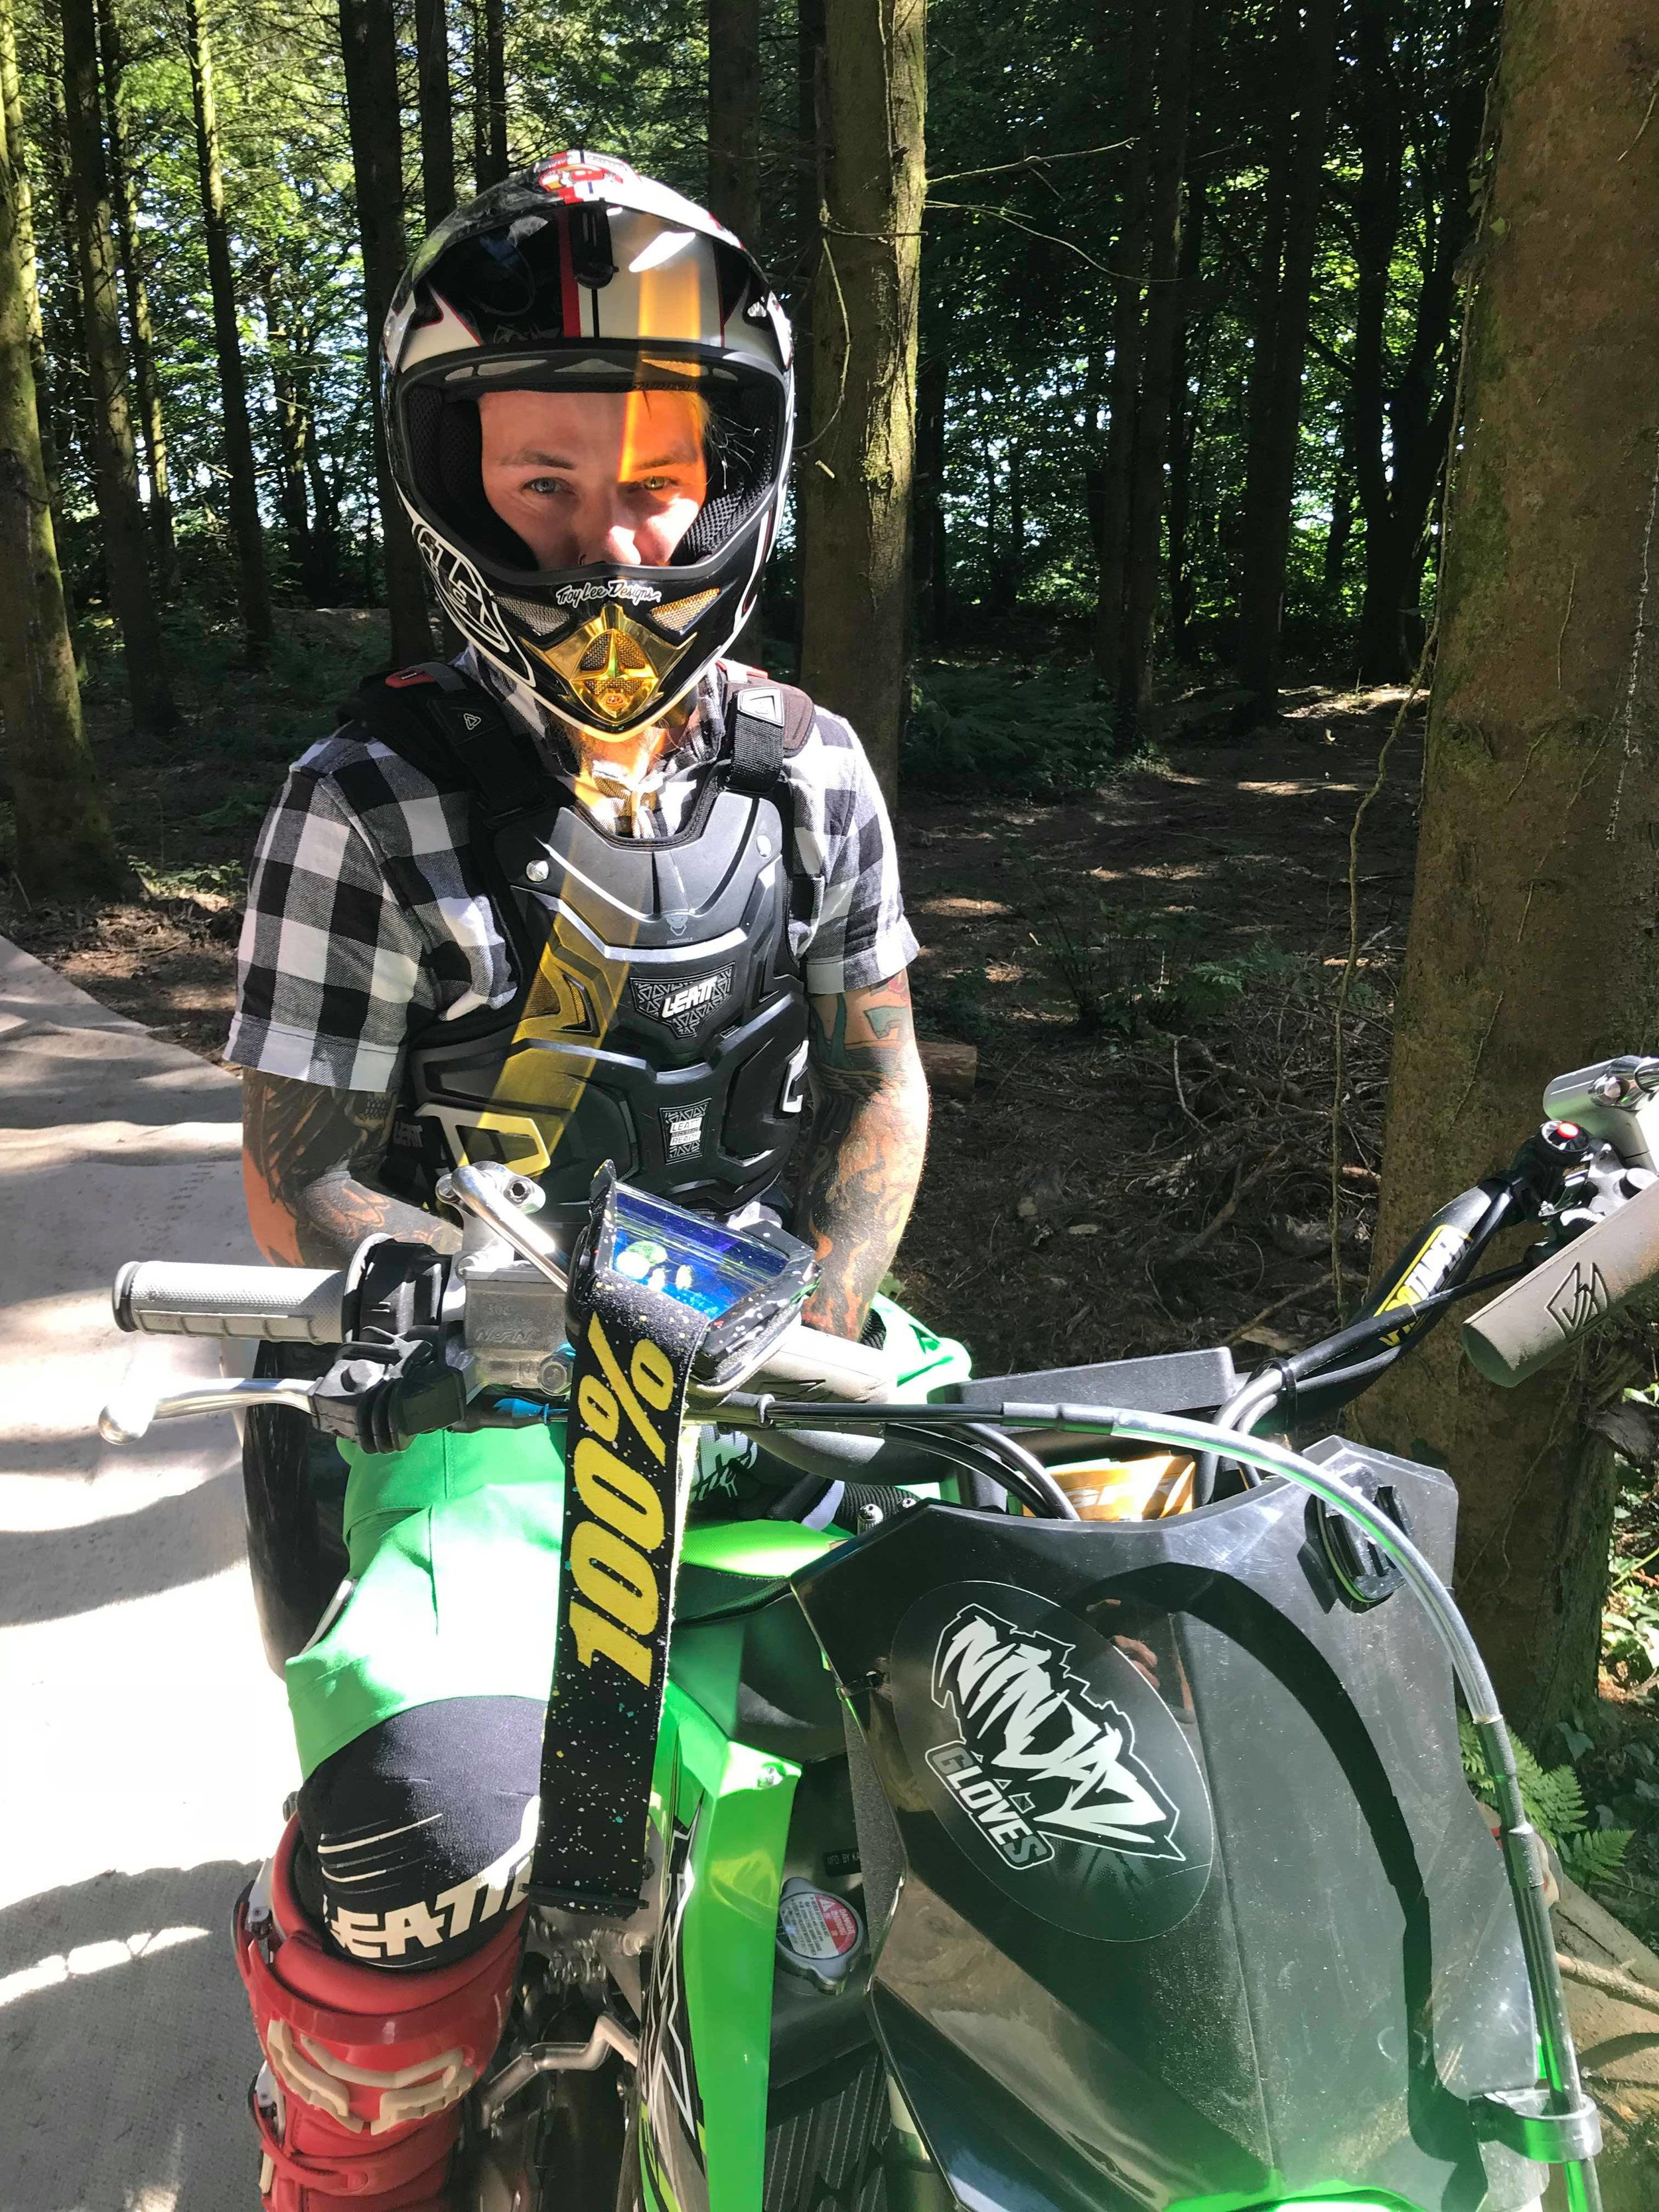 Wayne Jacobs FMX Rider